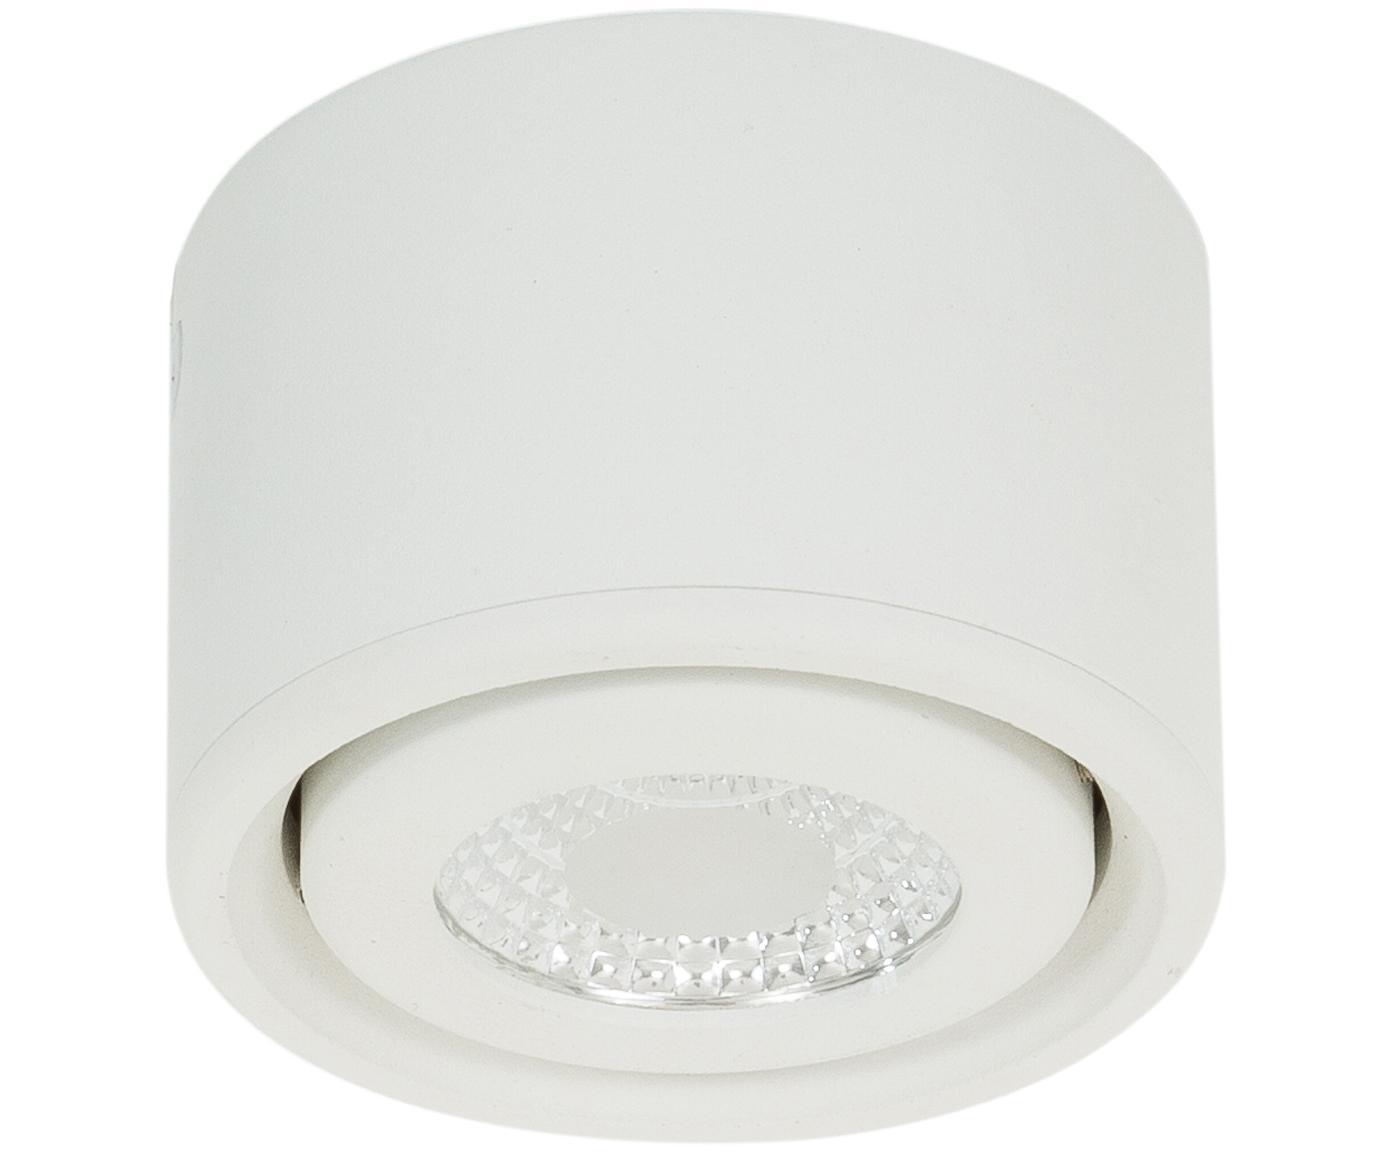 LED-Deckenspot Anzio in Weiss, Weiss, Ø 8 x H 5 cm